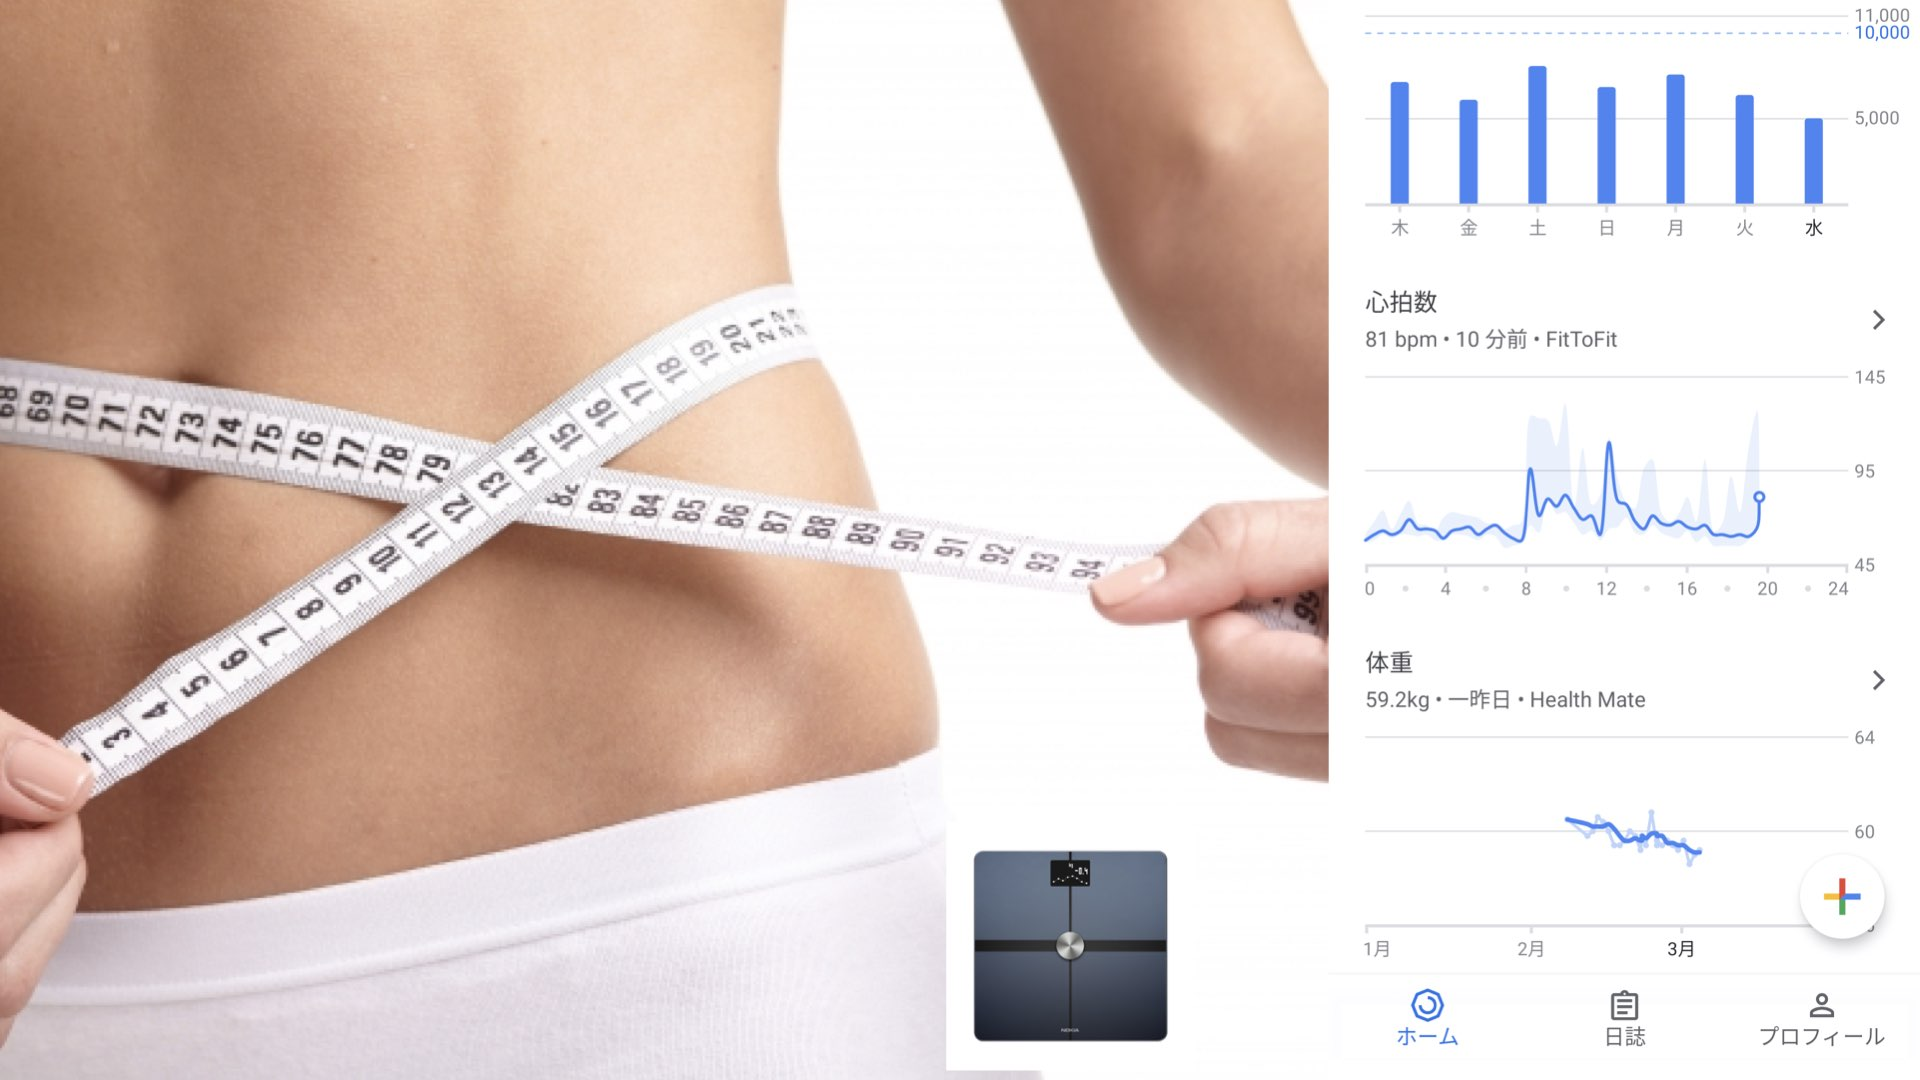 Wi-Fi&Google Fitアプリ対応の体重計が人生変わるほど便利